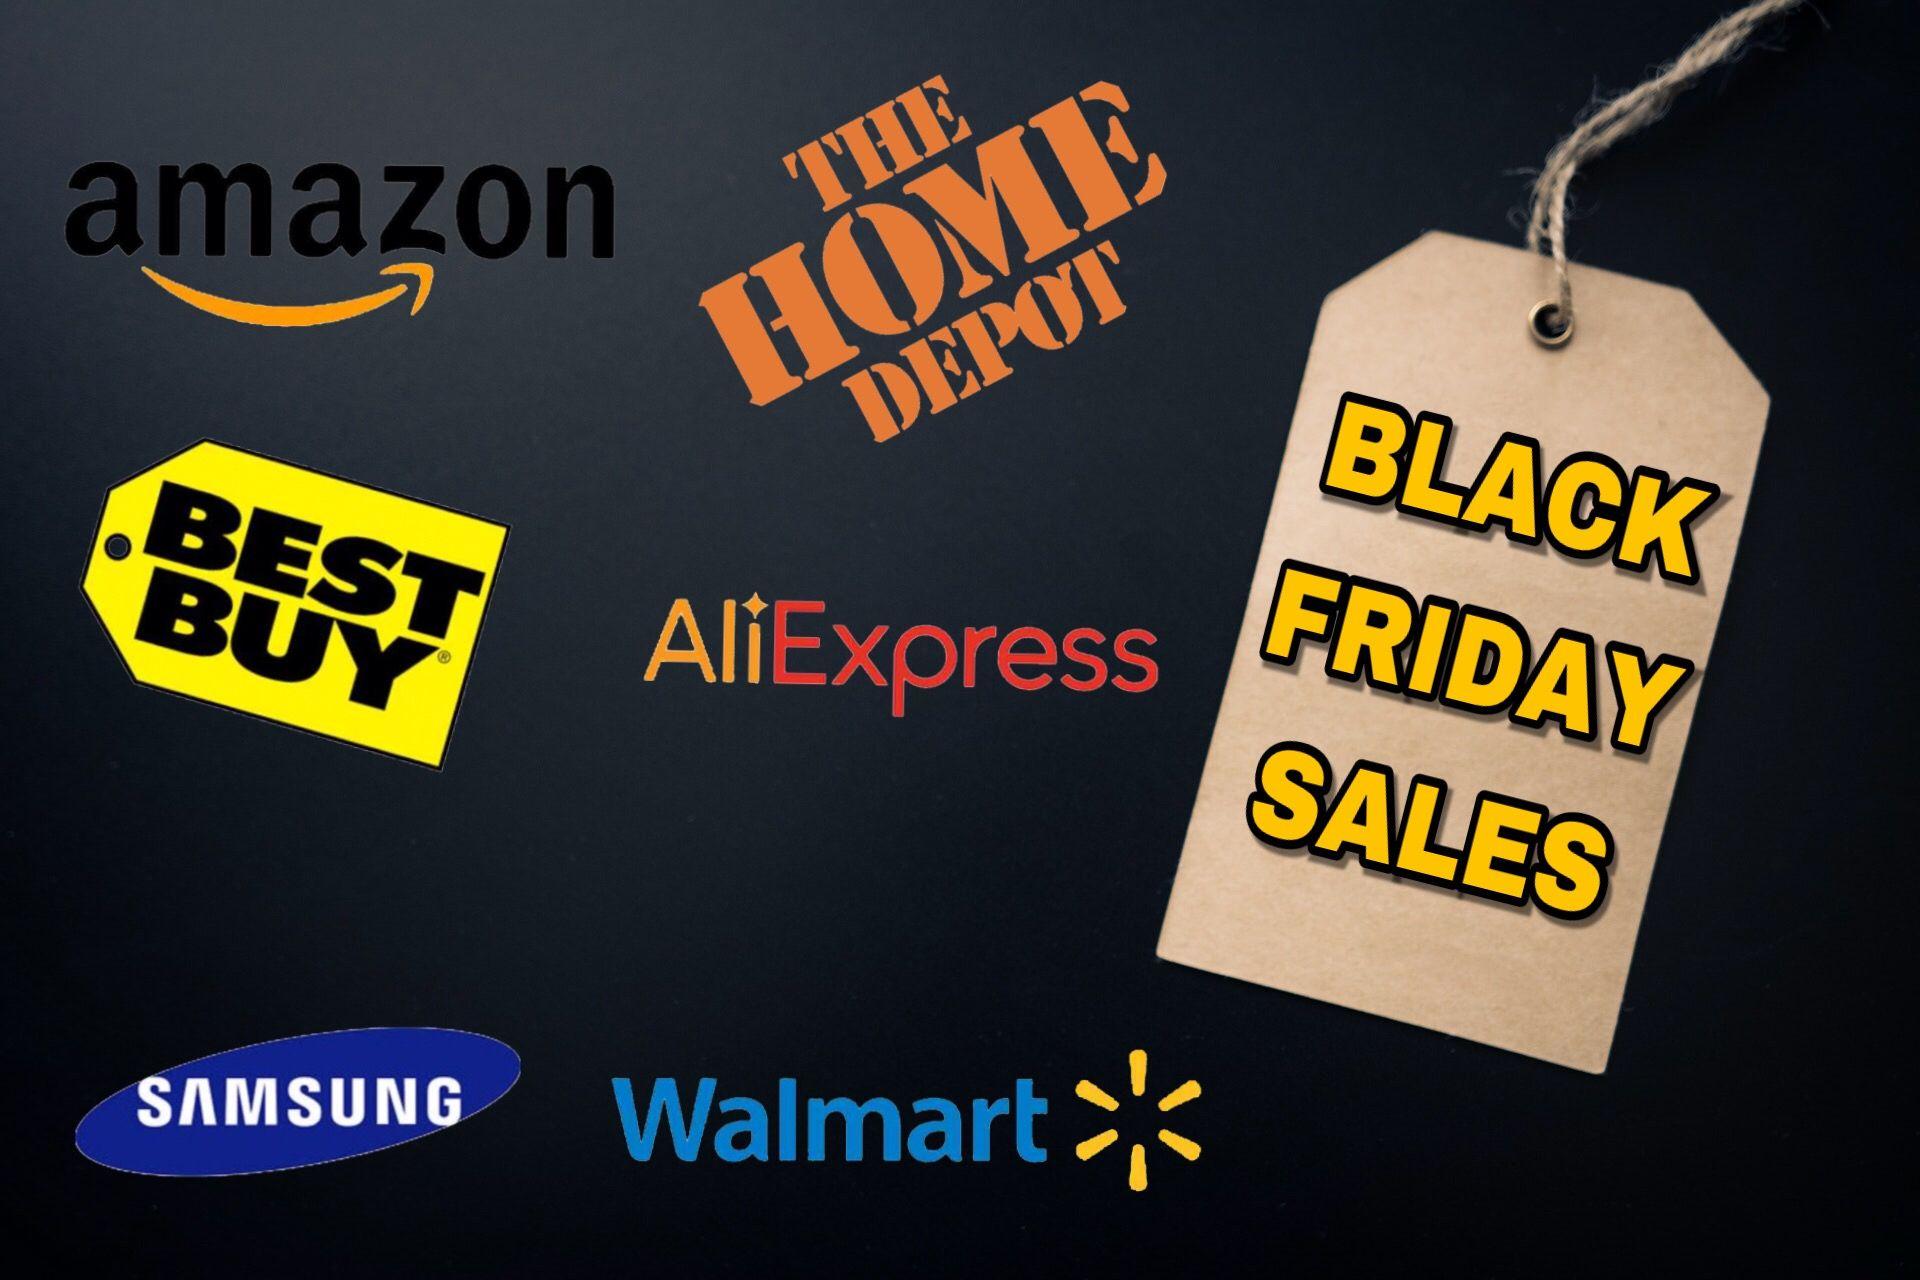 All Amazon Black Friday Deals Amazing Amazon Deals Amazing Deals On Black Friday Deals Amazon Black Friday Black Friday Tv Deals